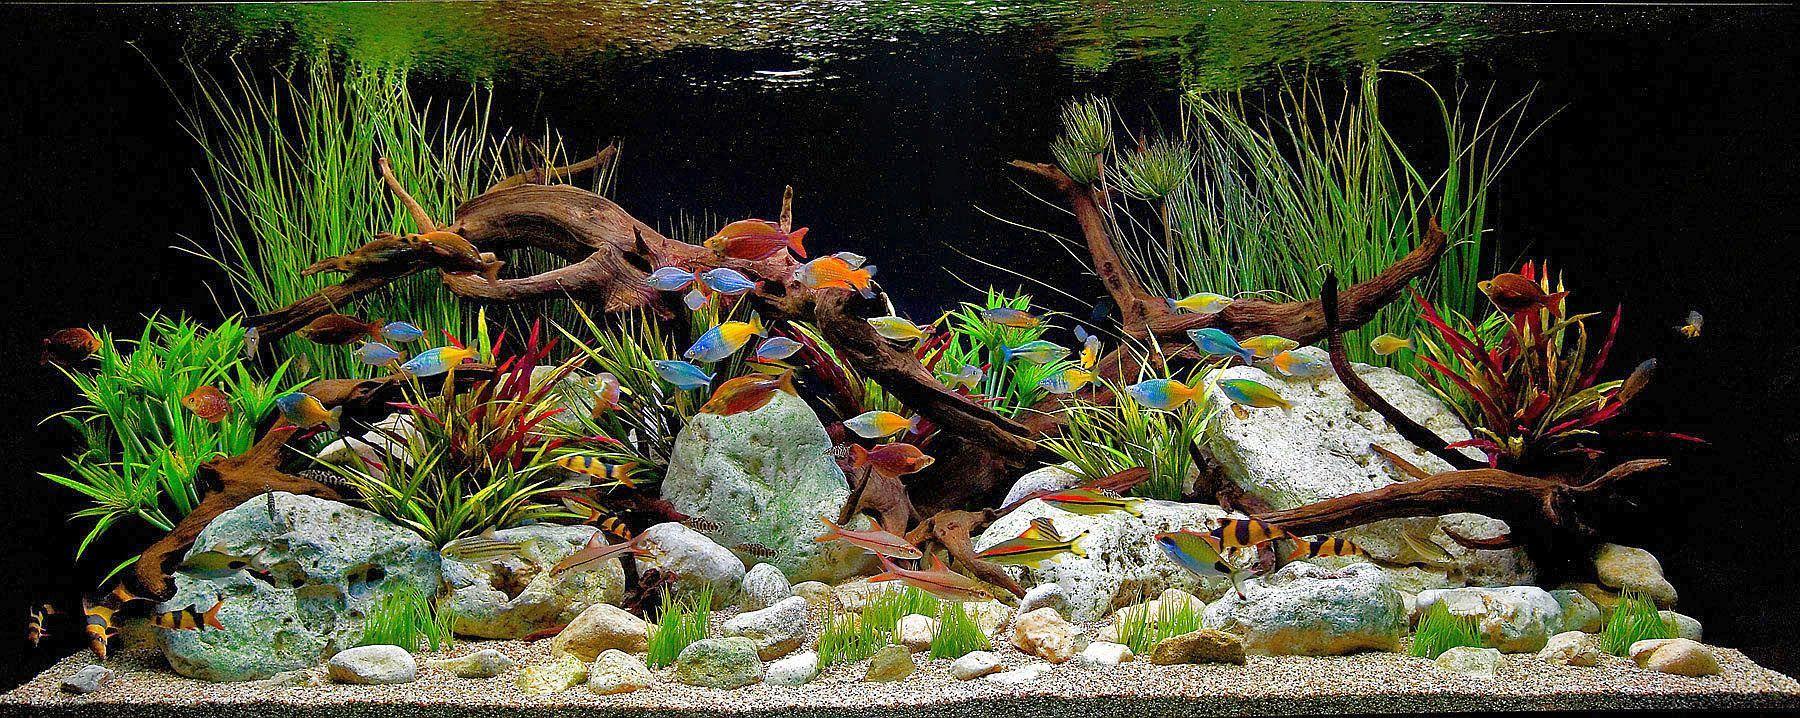 Freshwater Tropical Aquarium Fish Tropical Aquarium Freshwater Aquarium Aquarium Design